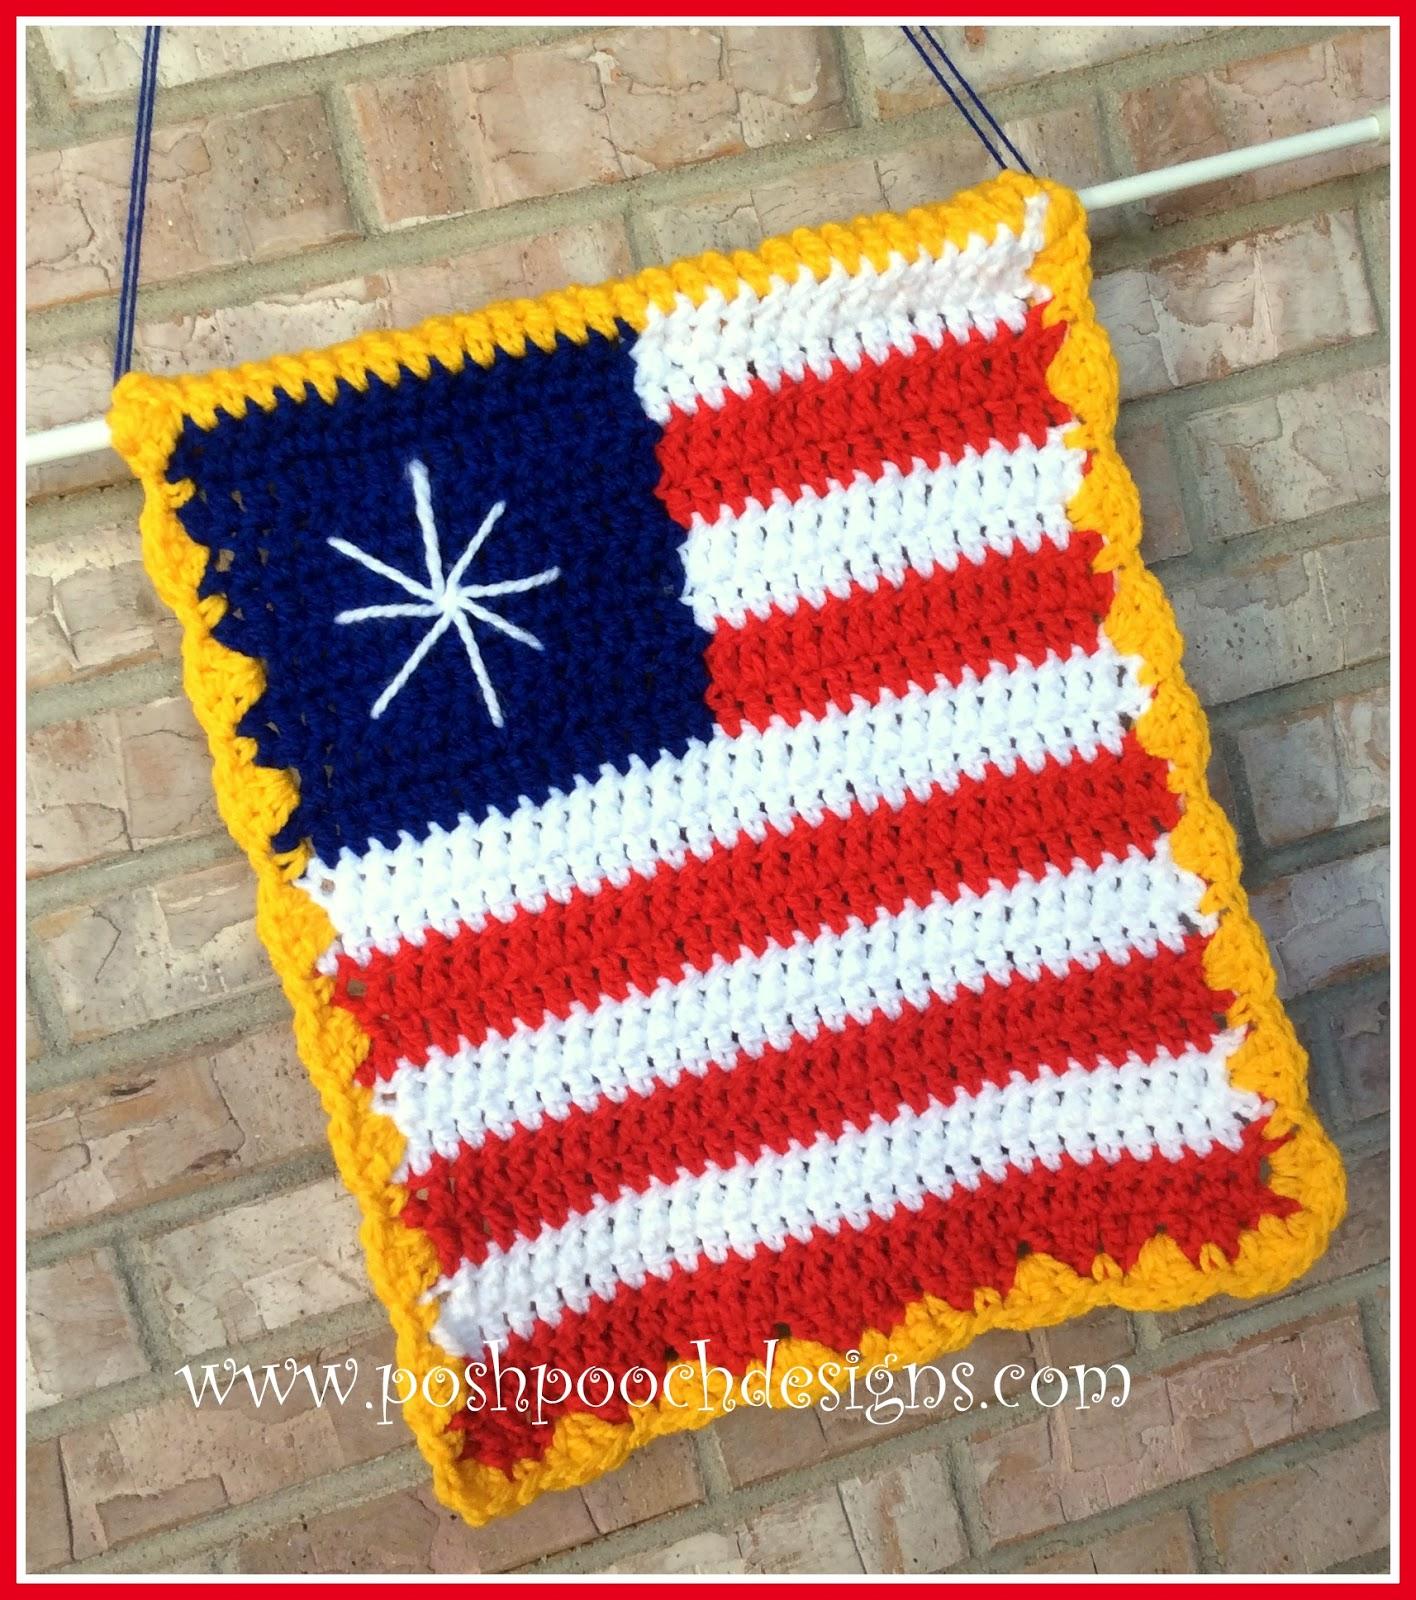 Posh Pooch Designs Dog Clothes: American Flag Garden Sign Crochet ...